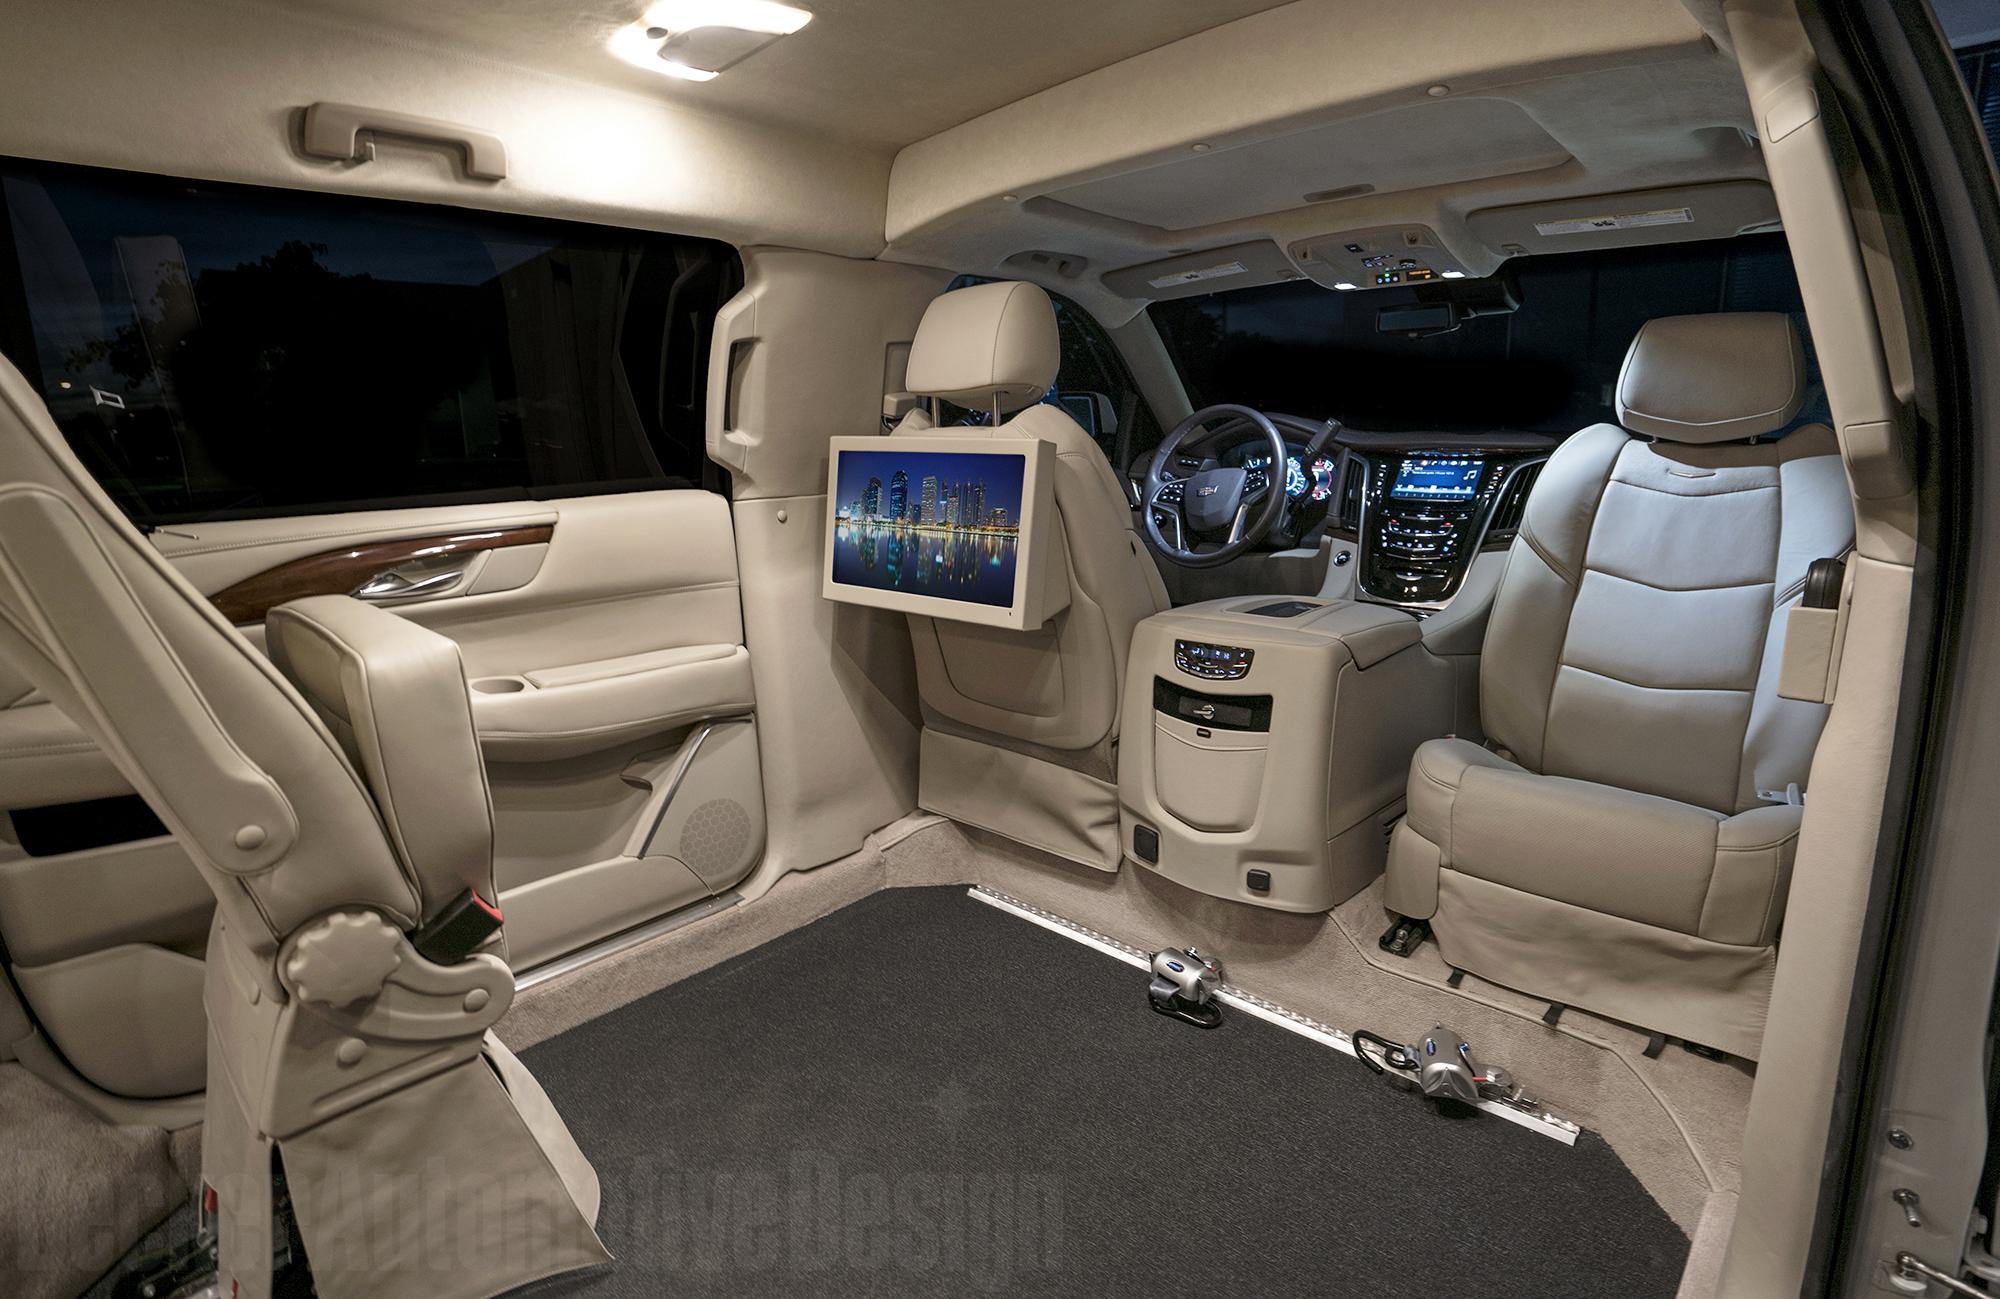 Mercedes Benz Pre Owned >> Becker Automotive Design // Luxury Transport Coaches ...